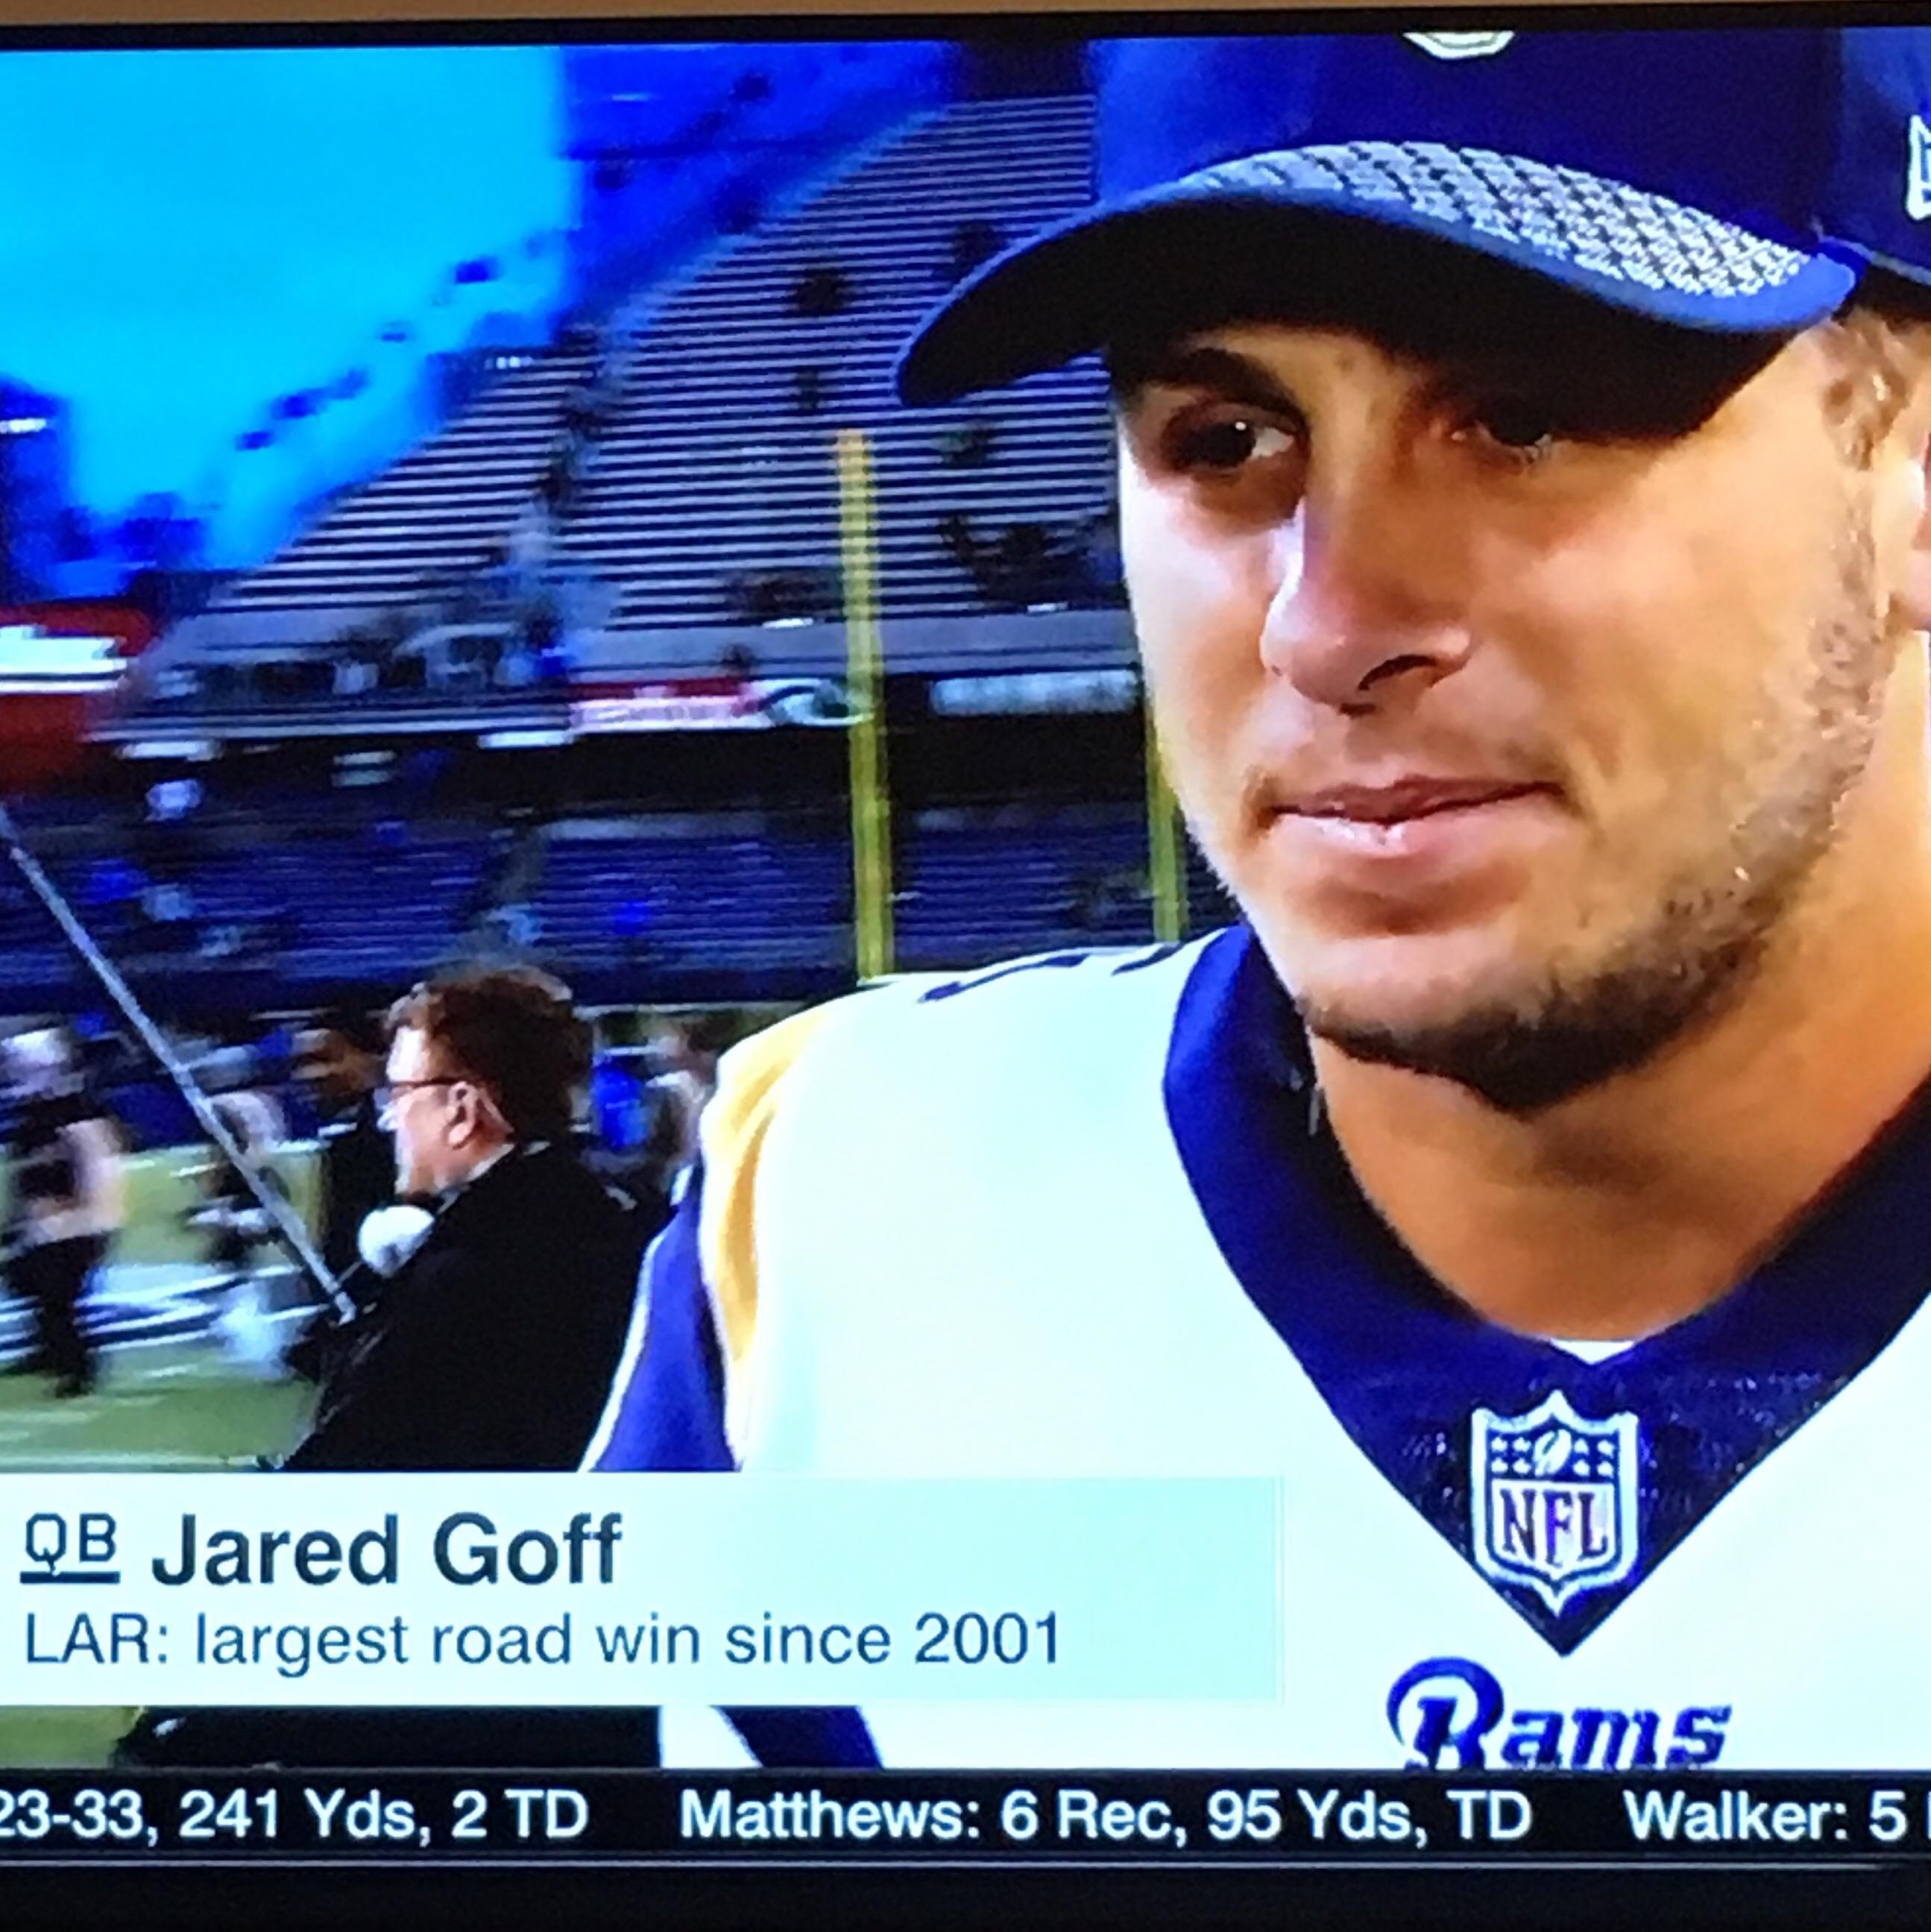 Ryan Gosling Plays Qb For The La Rams Jared Goff Cute Posts La Rams